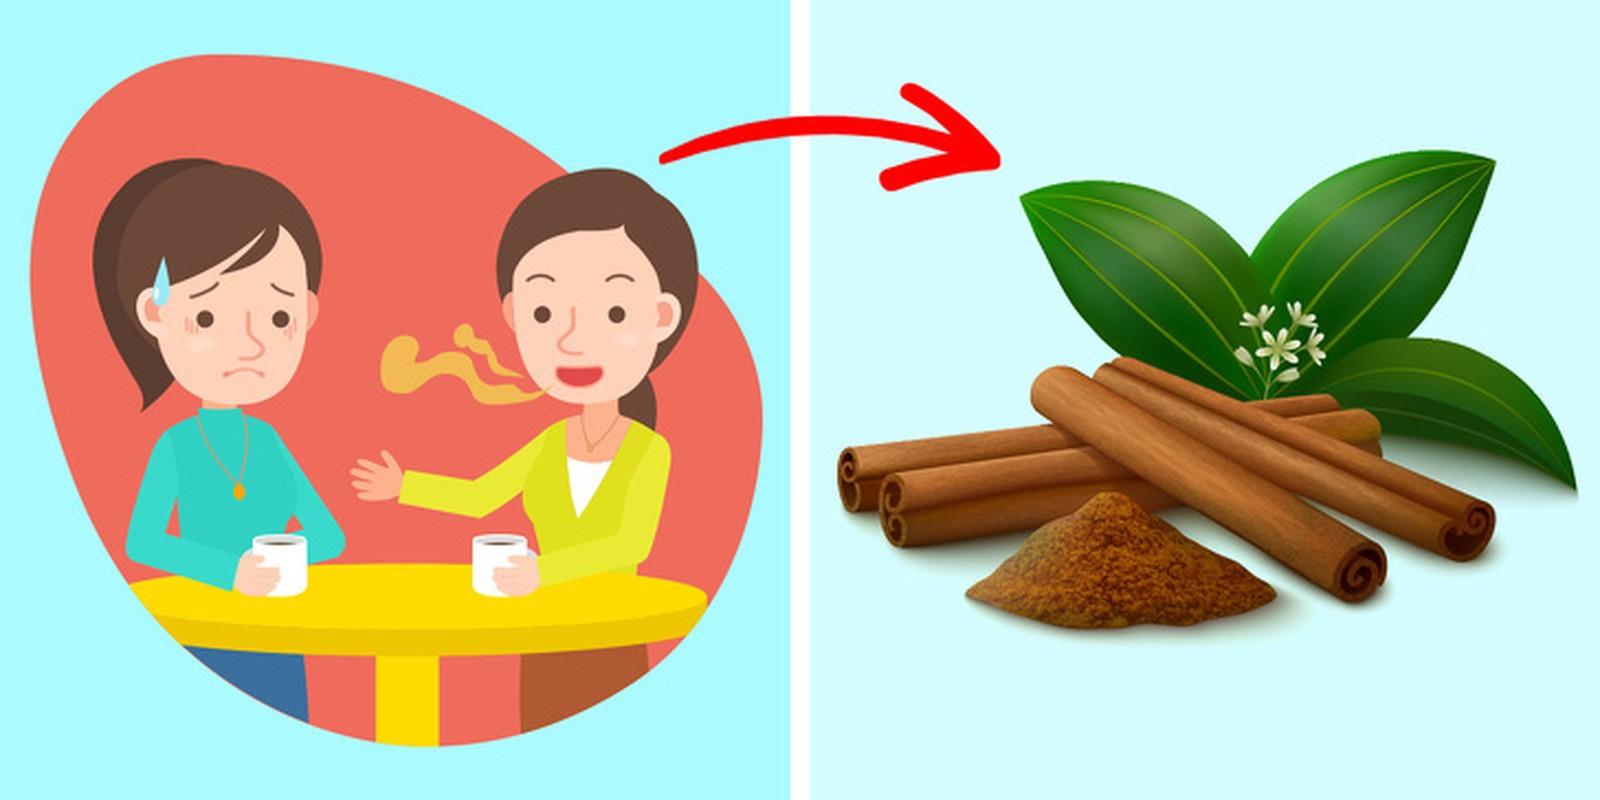 10 thuc pham giup co the ban toa huong thom quyen ru-Hinh-5